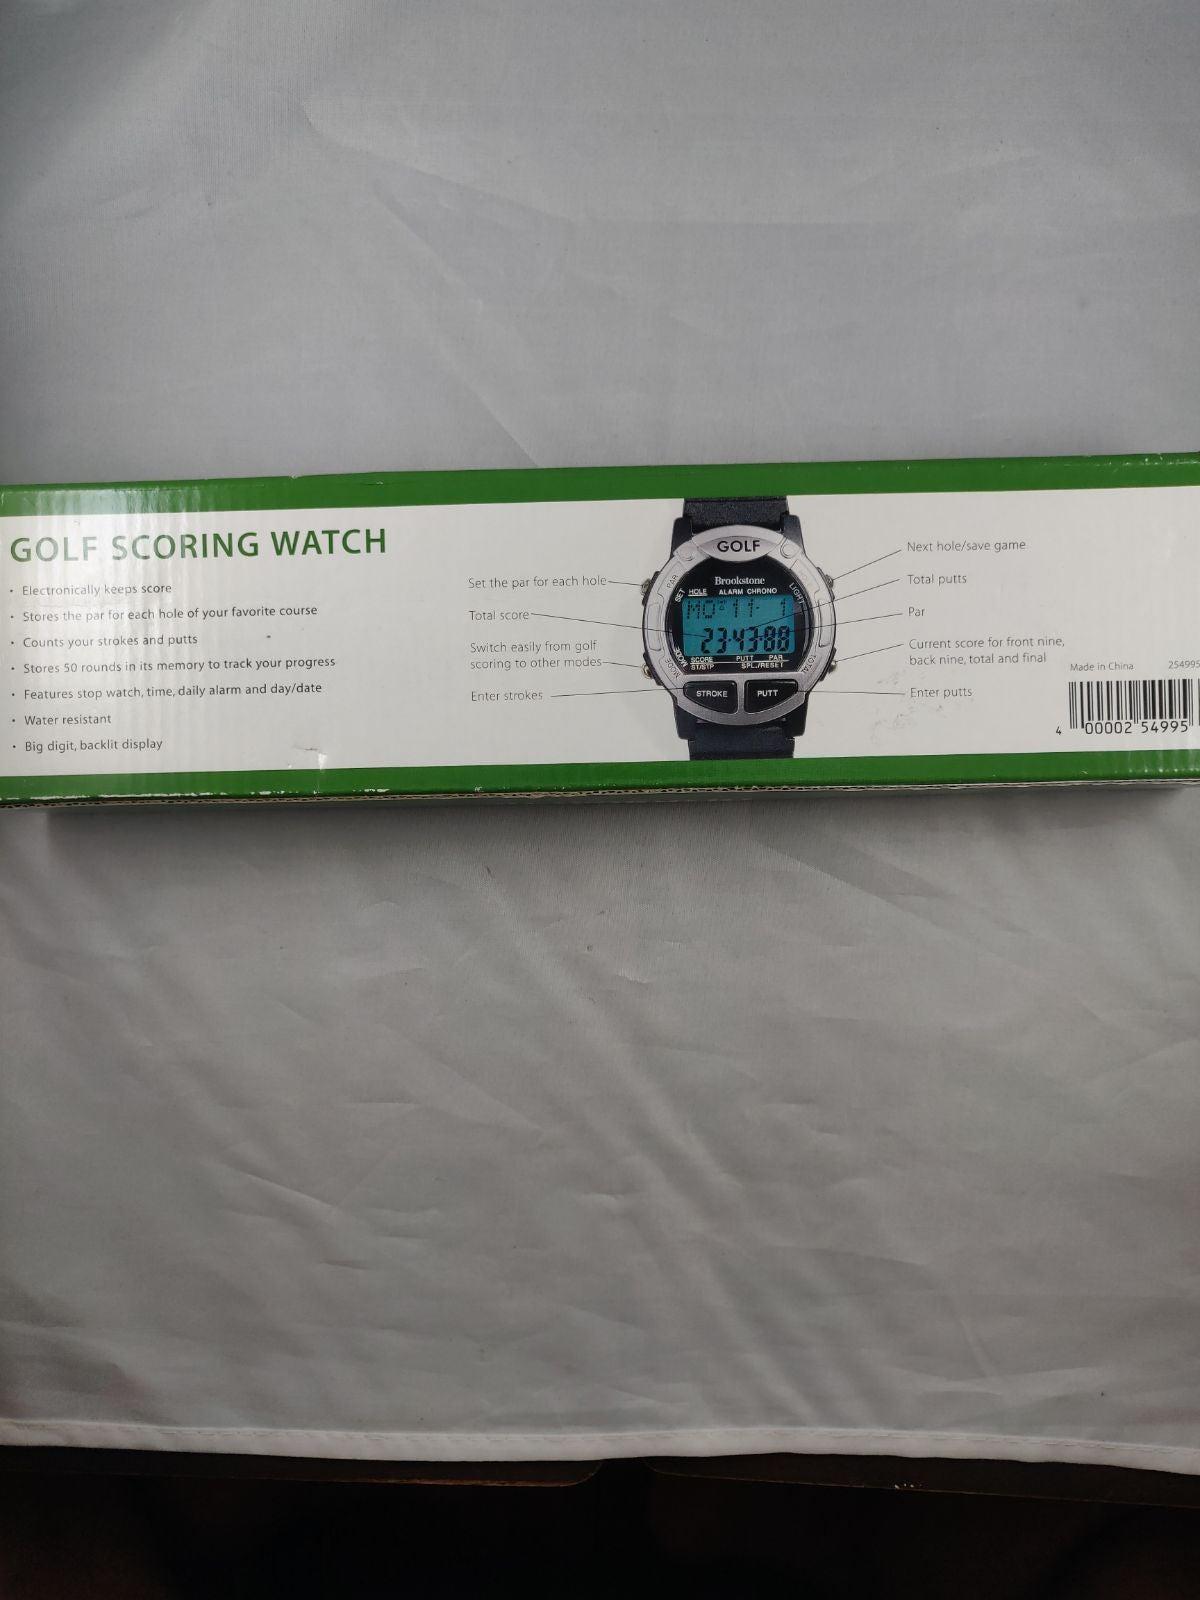 Brookstone electronic golf scoring watch